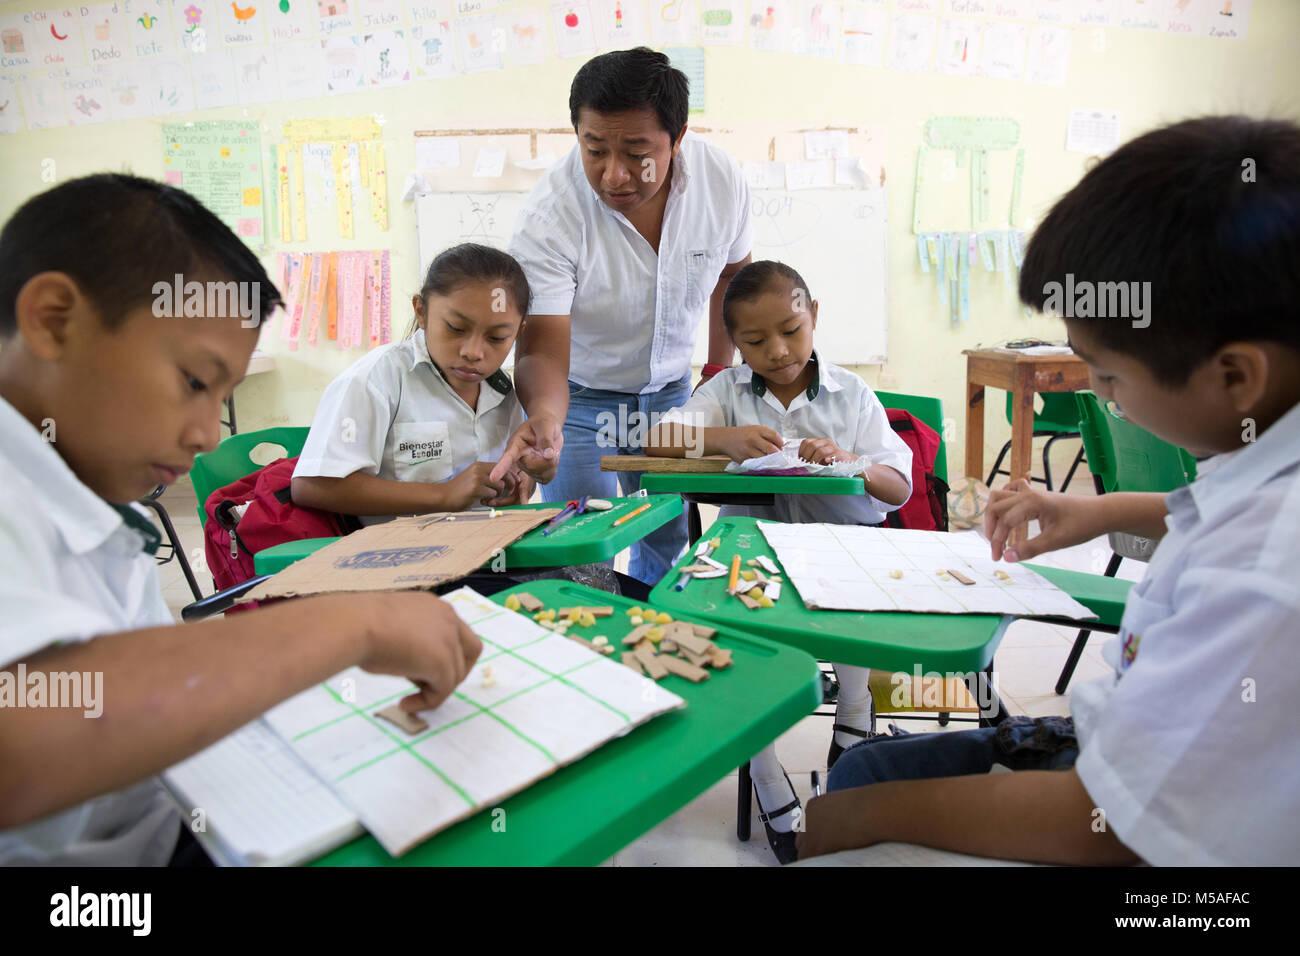 Headmaster Jose Manuel Cen Kauil teaches a Mayan mathematicsclass at Ignacio Ramirez Calzada primary school - Stock Image